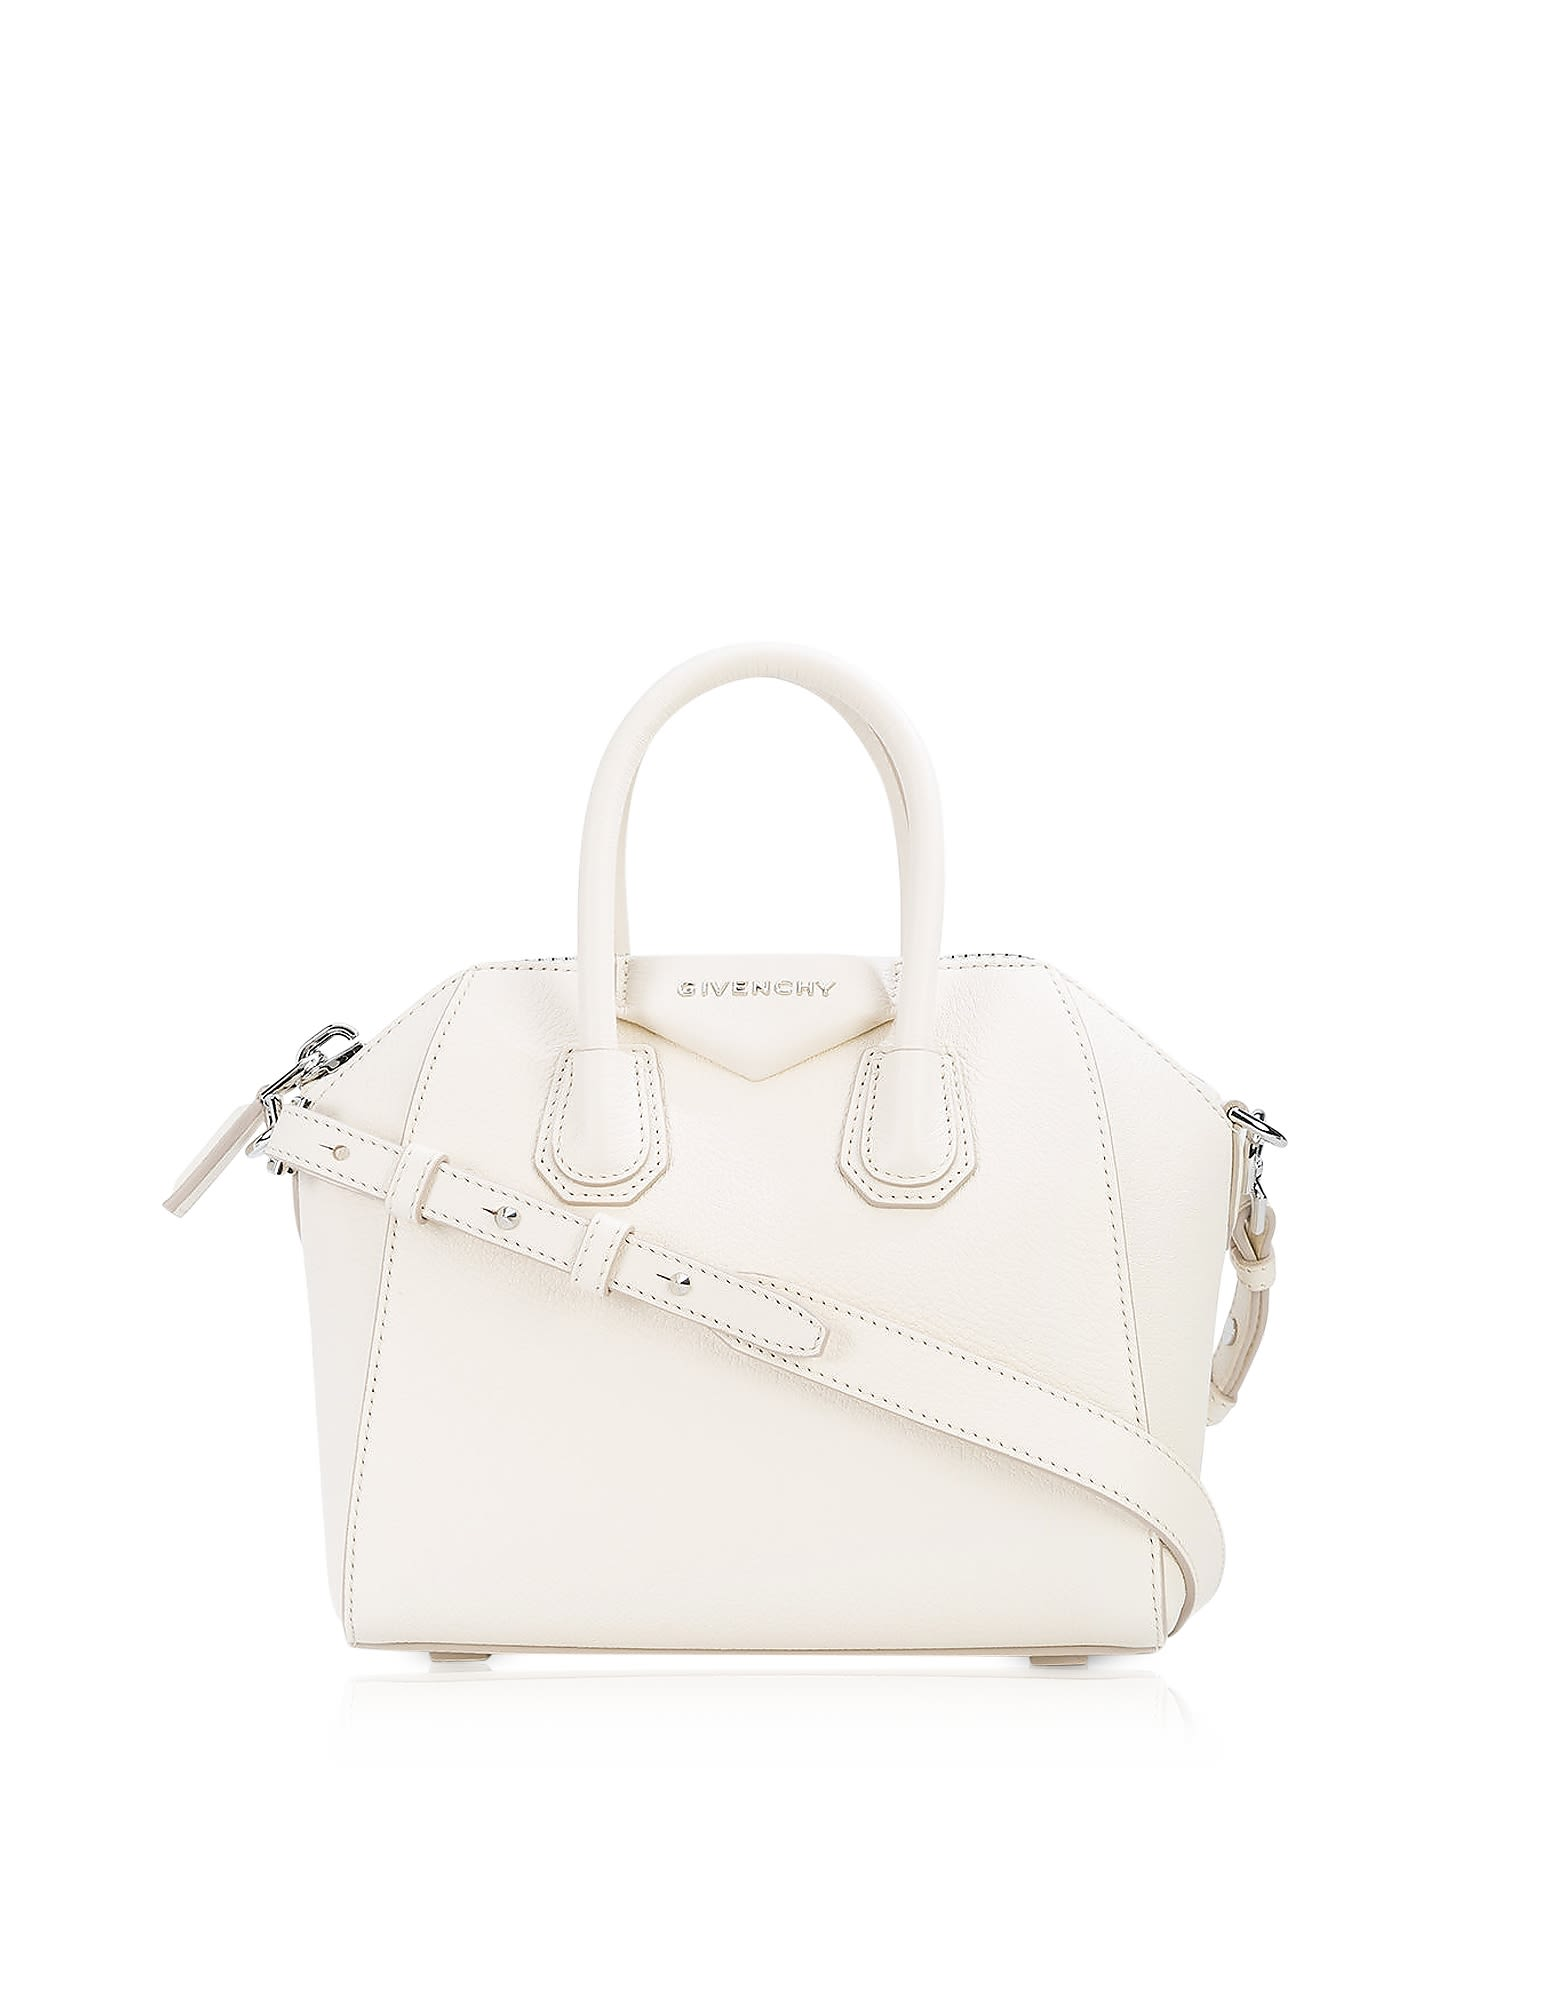 ac0a3a90f2 Givenchy Antigona Mini Off White Leather Satchel Bag | ModeSens